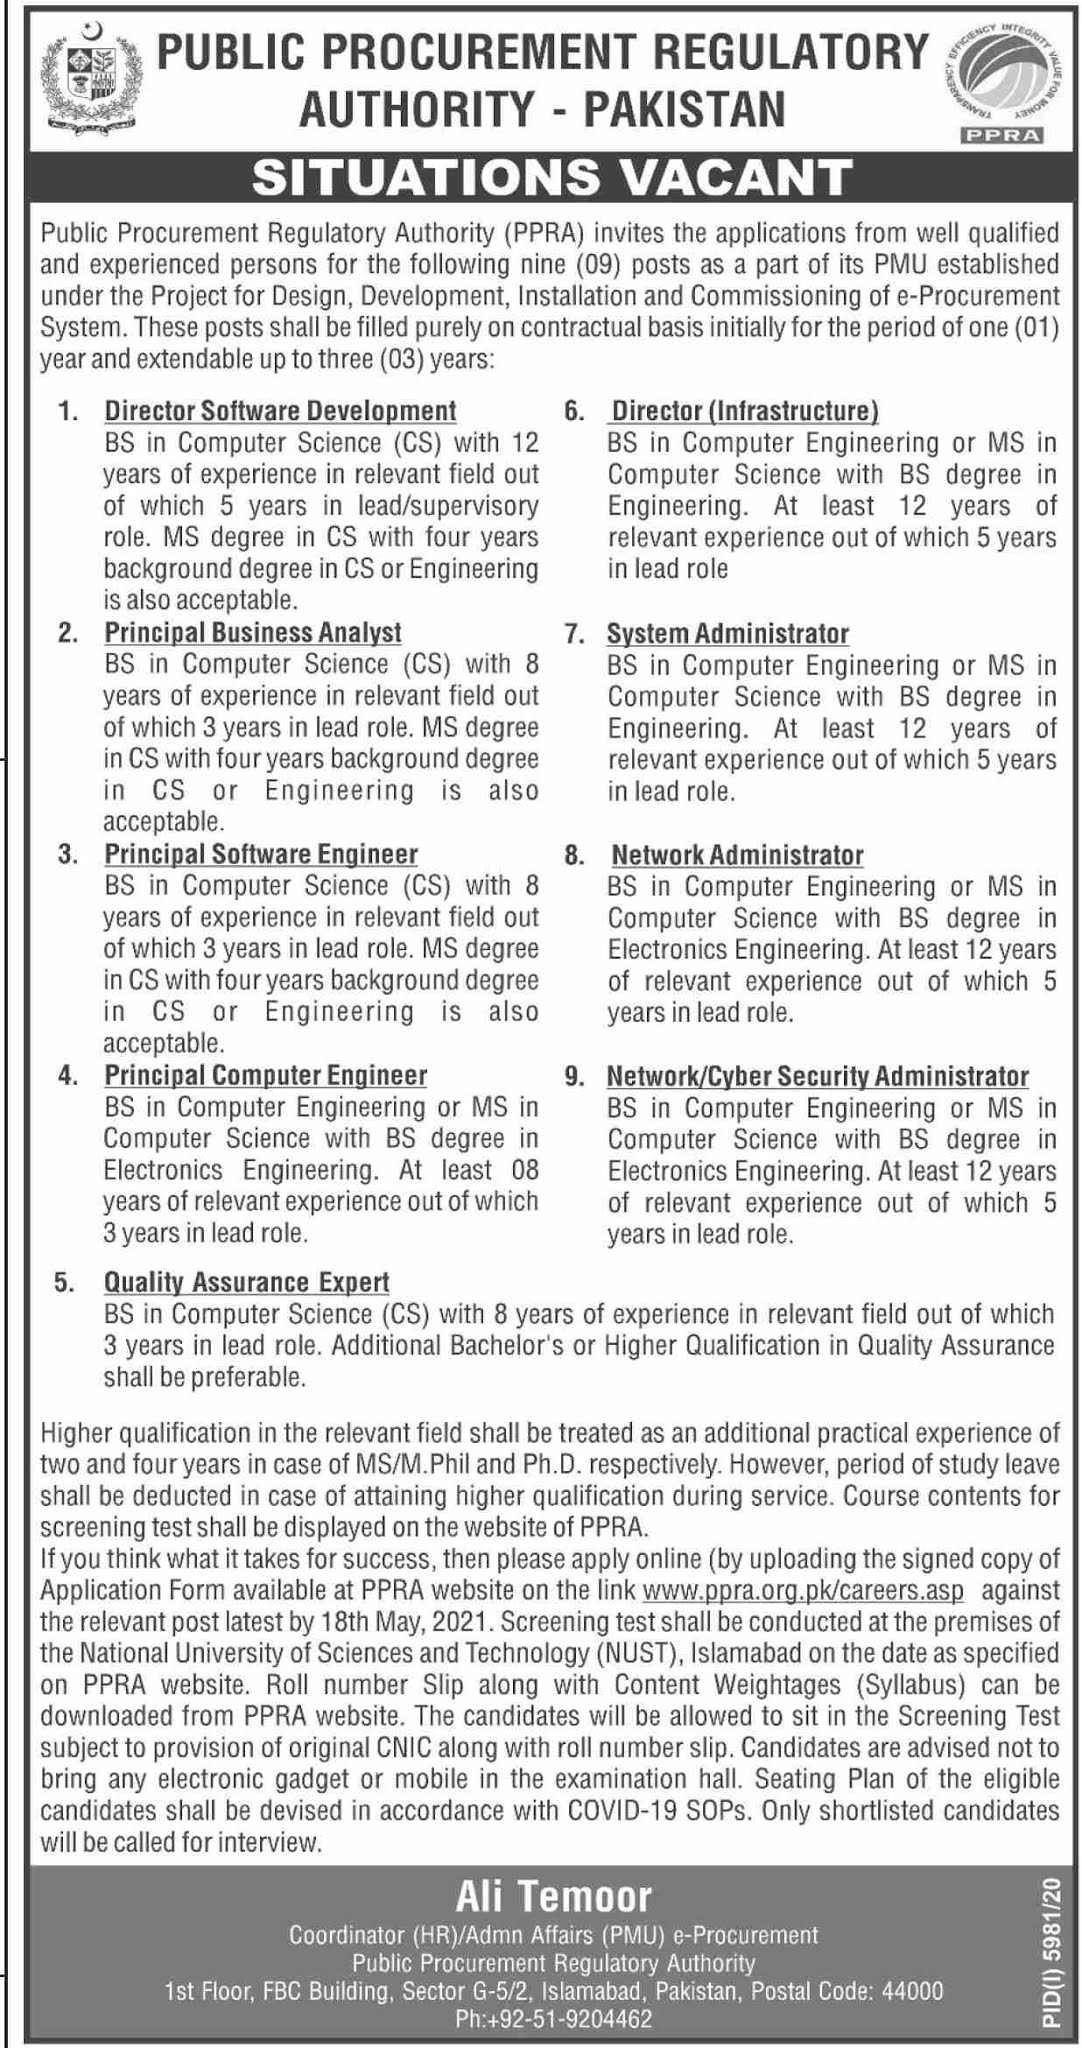 Latest Public Procurement Regulatory Authority Pakistan Jobs Advertisement 2021